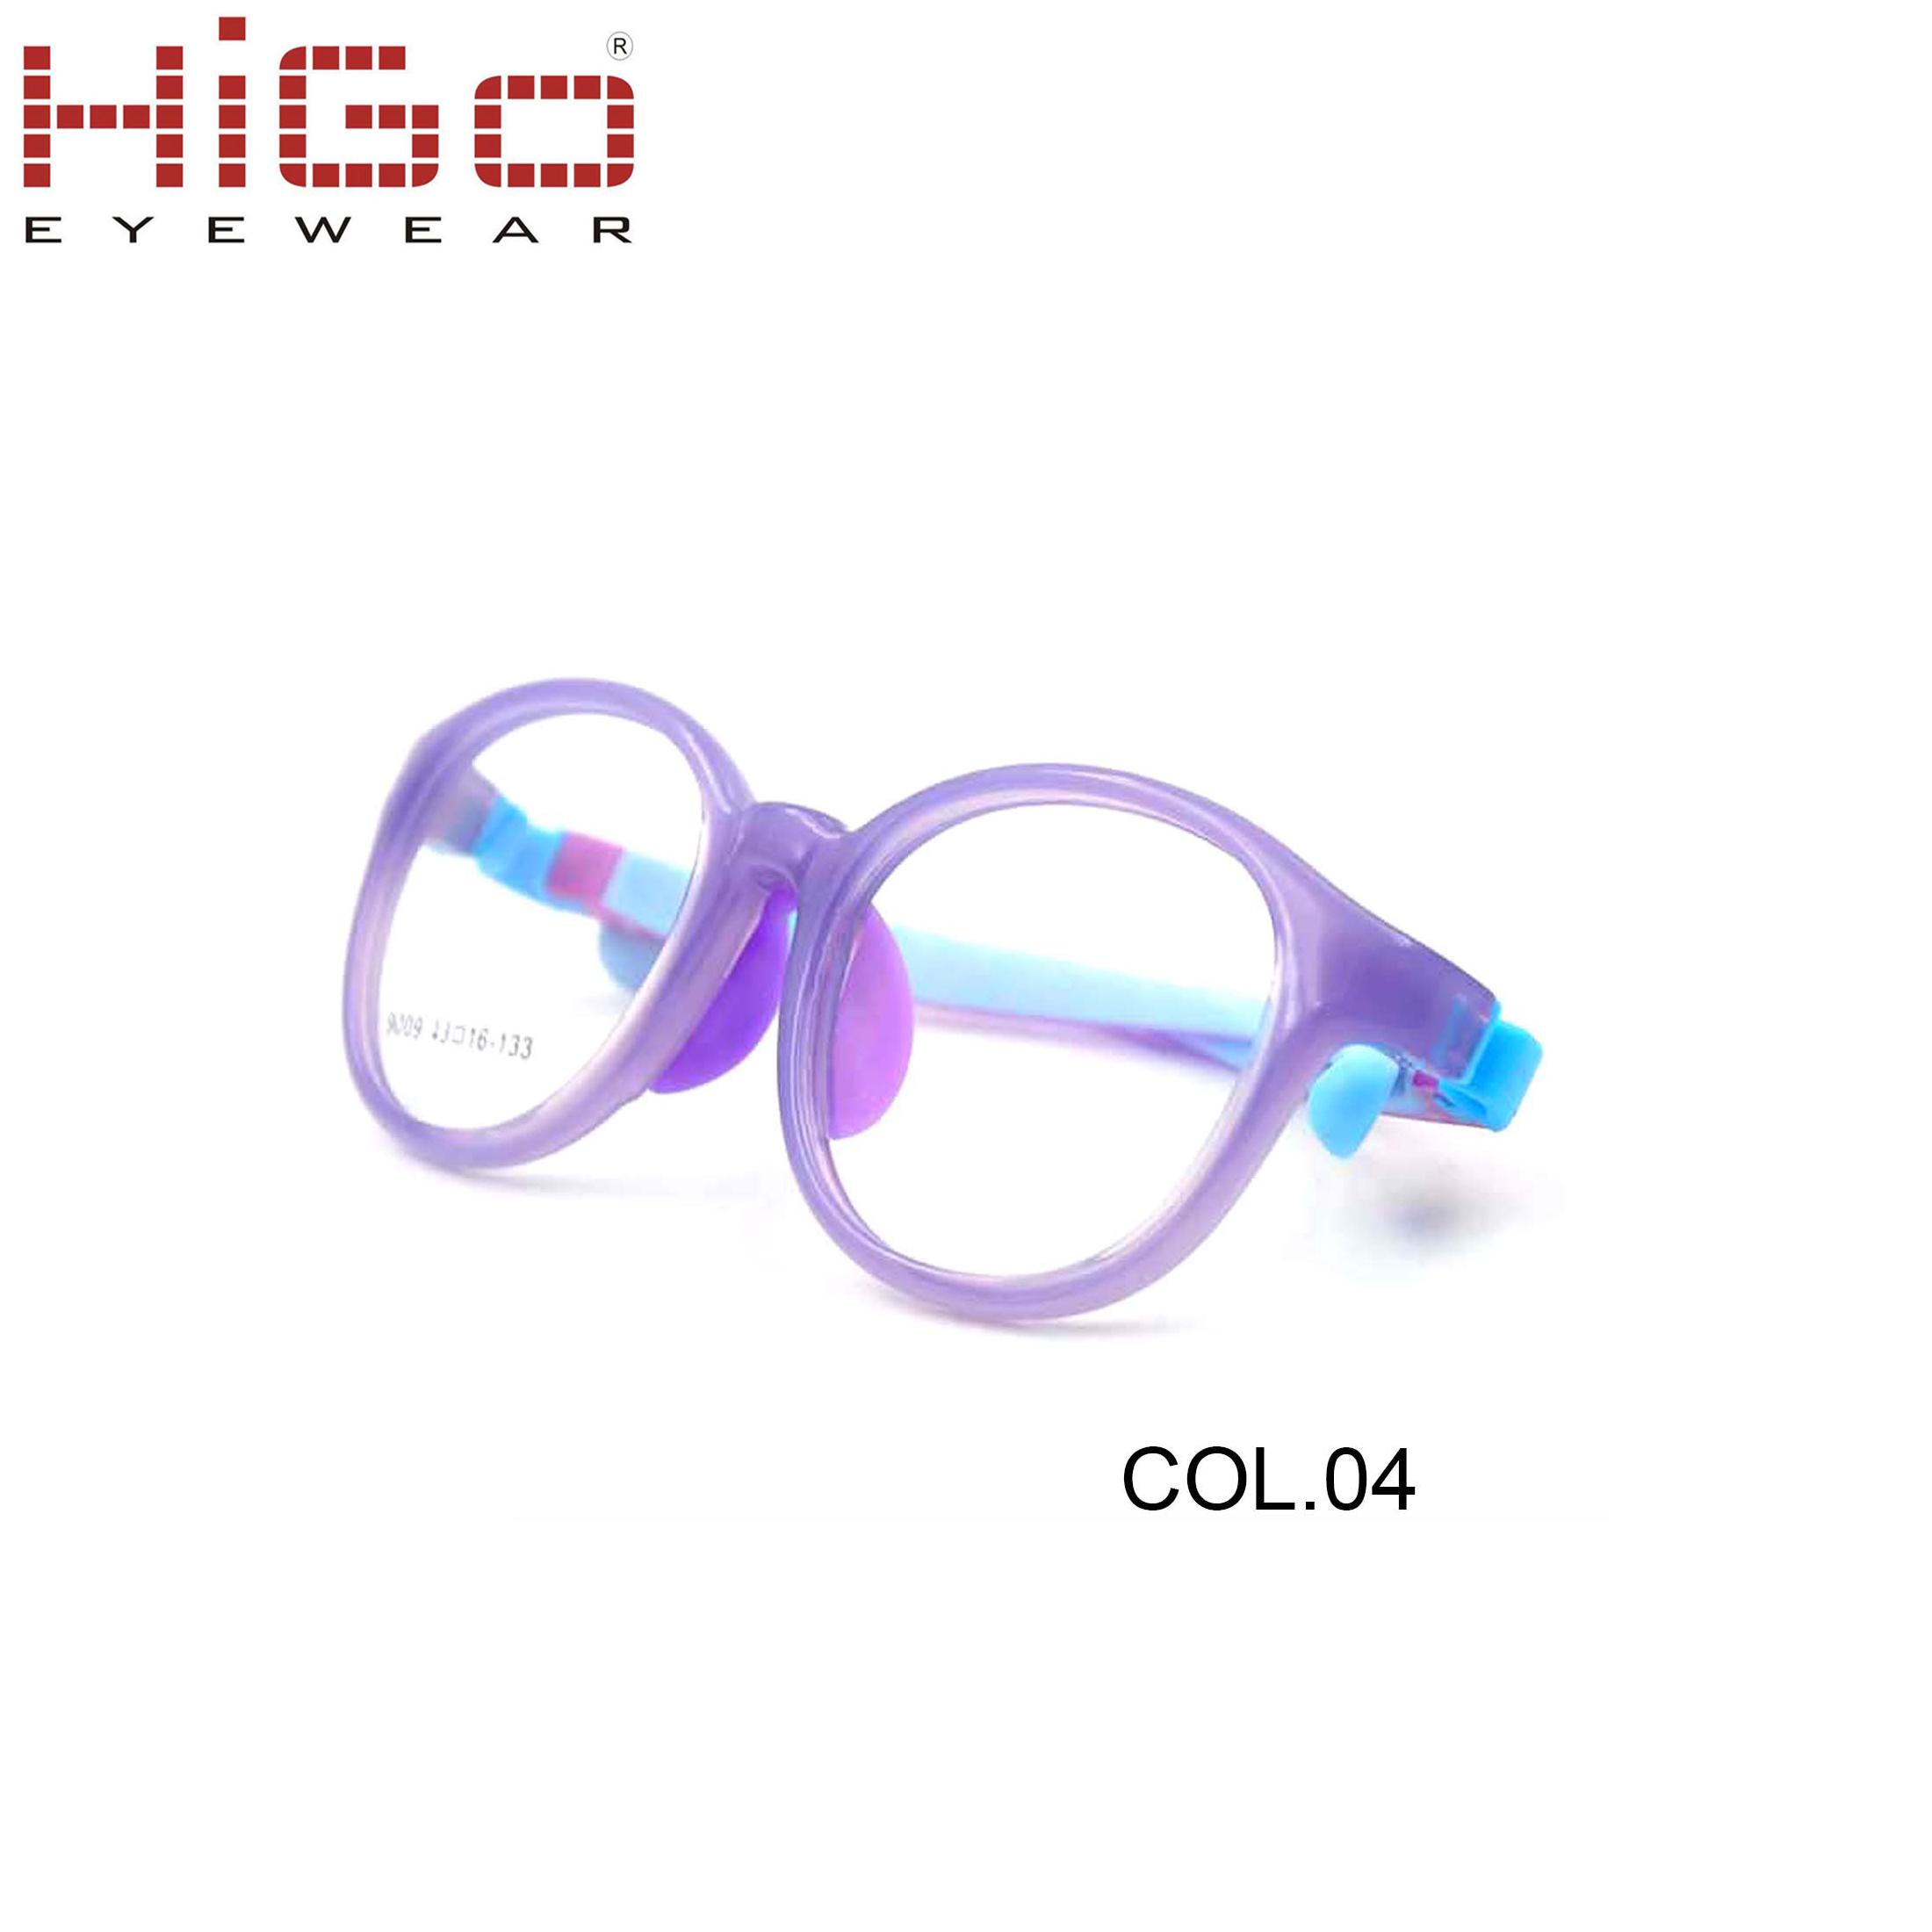 9009 C04.jpg